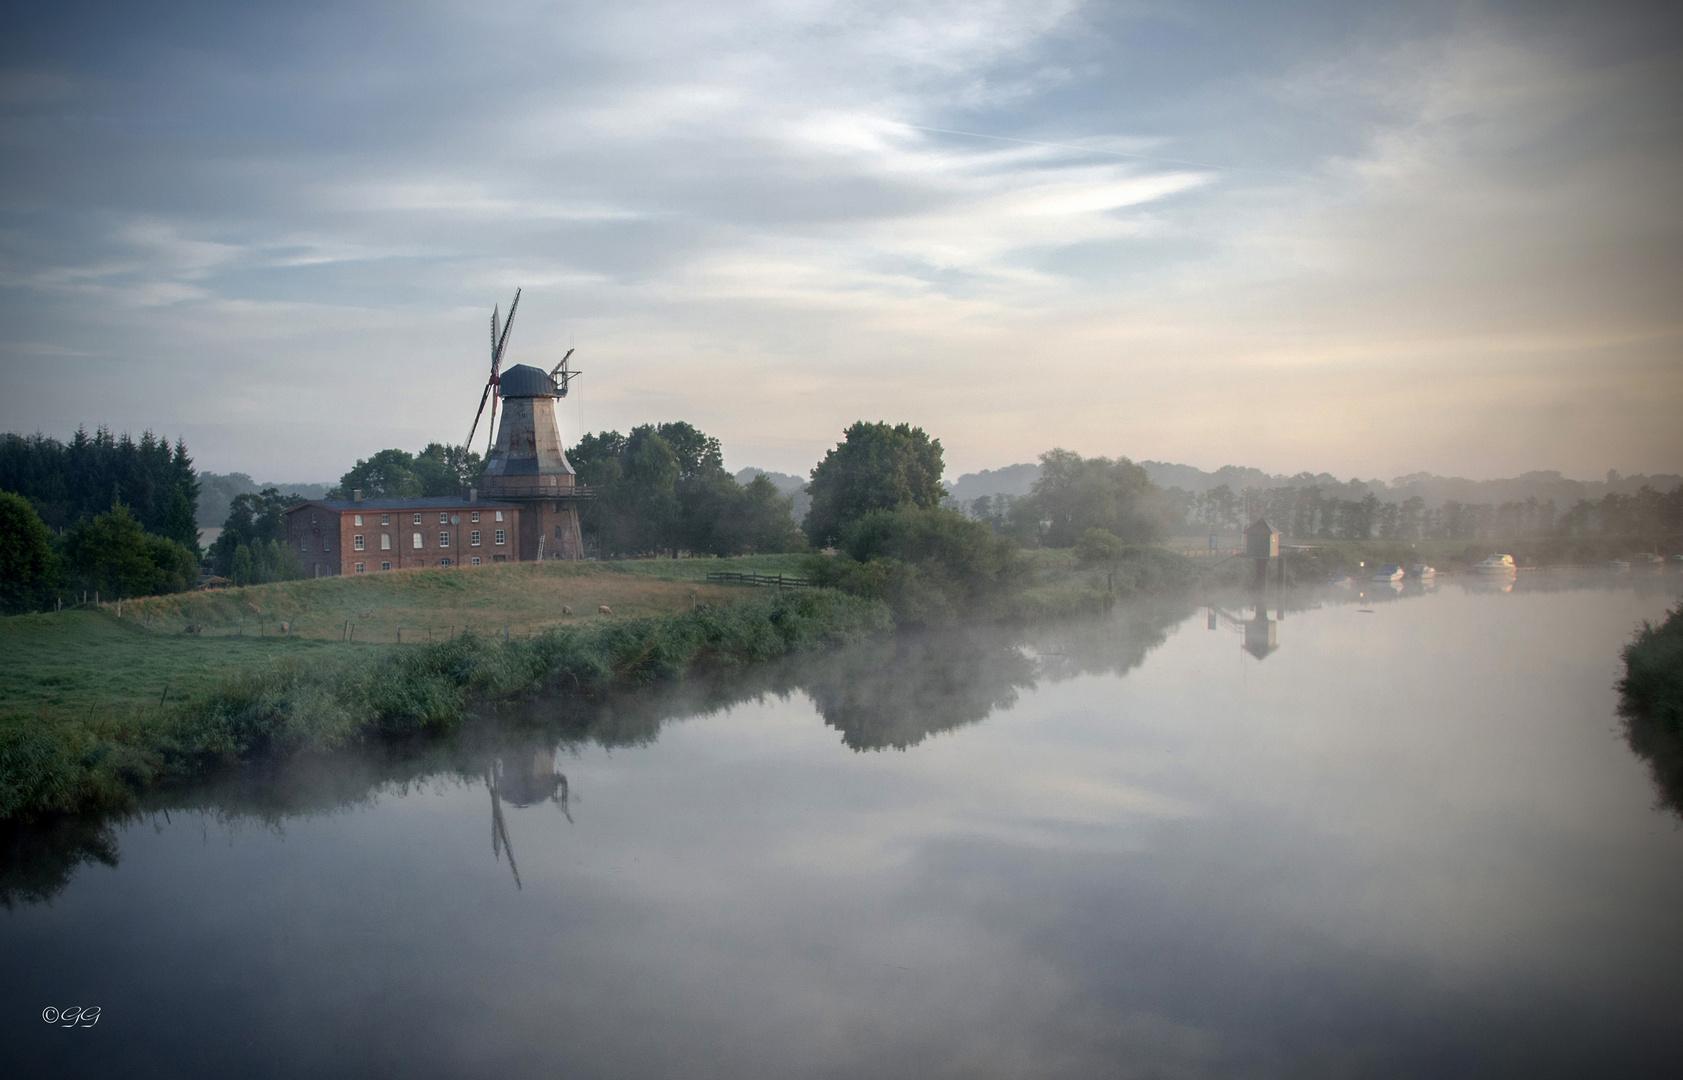 Die Hechthausener Windmühle